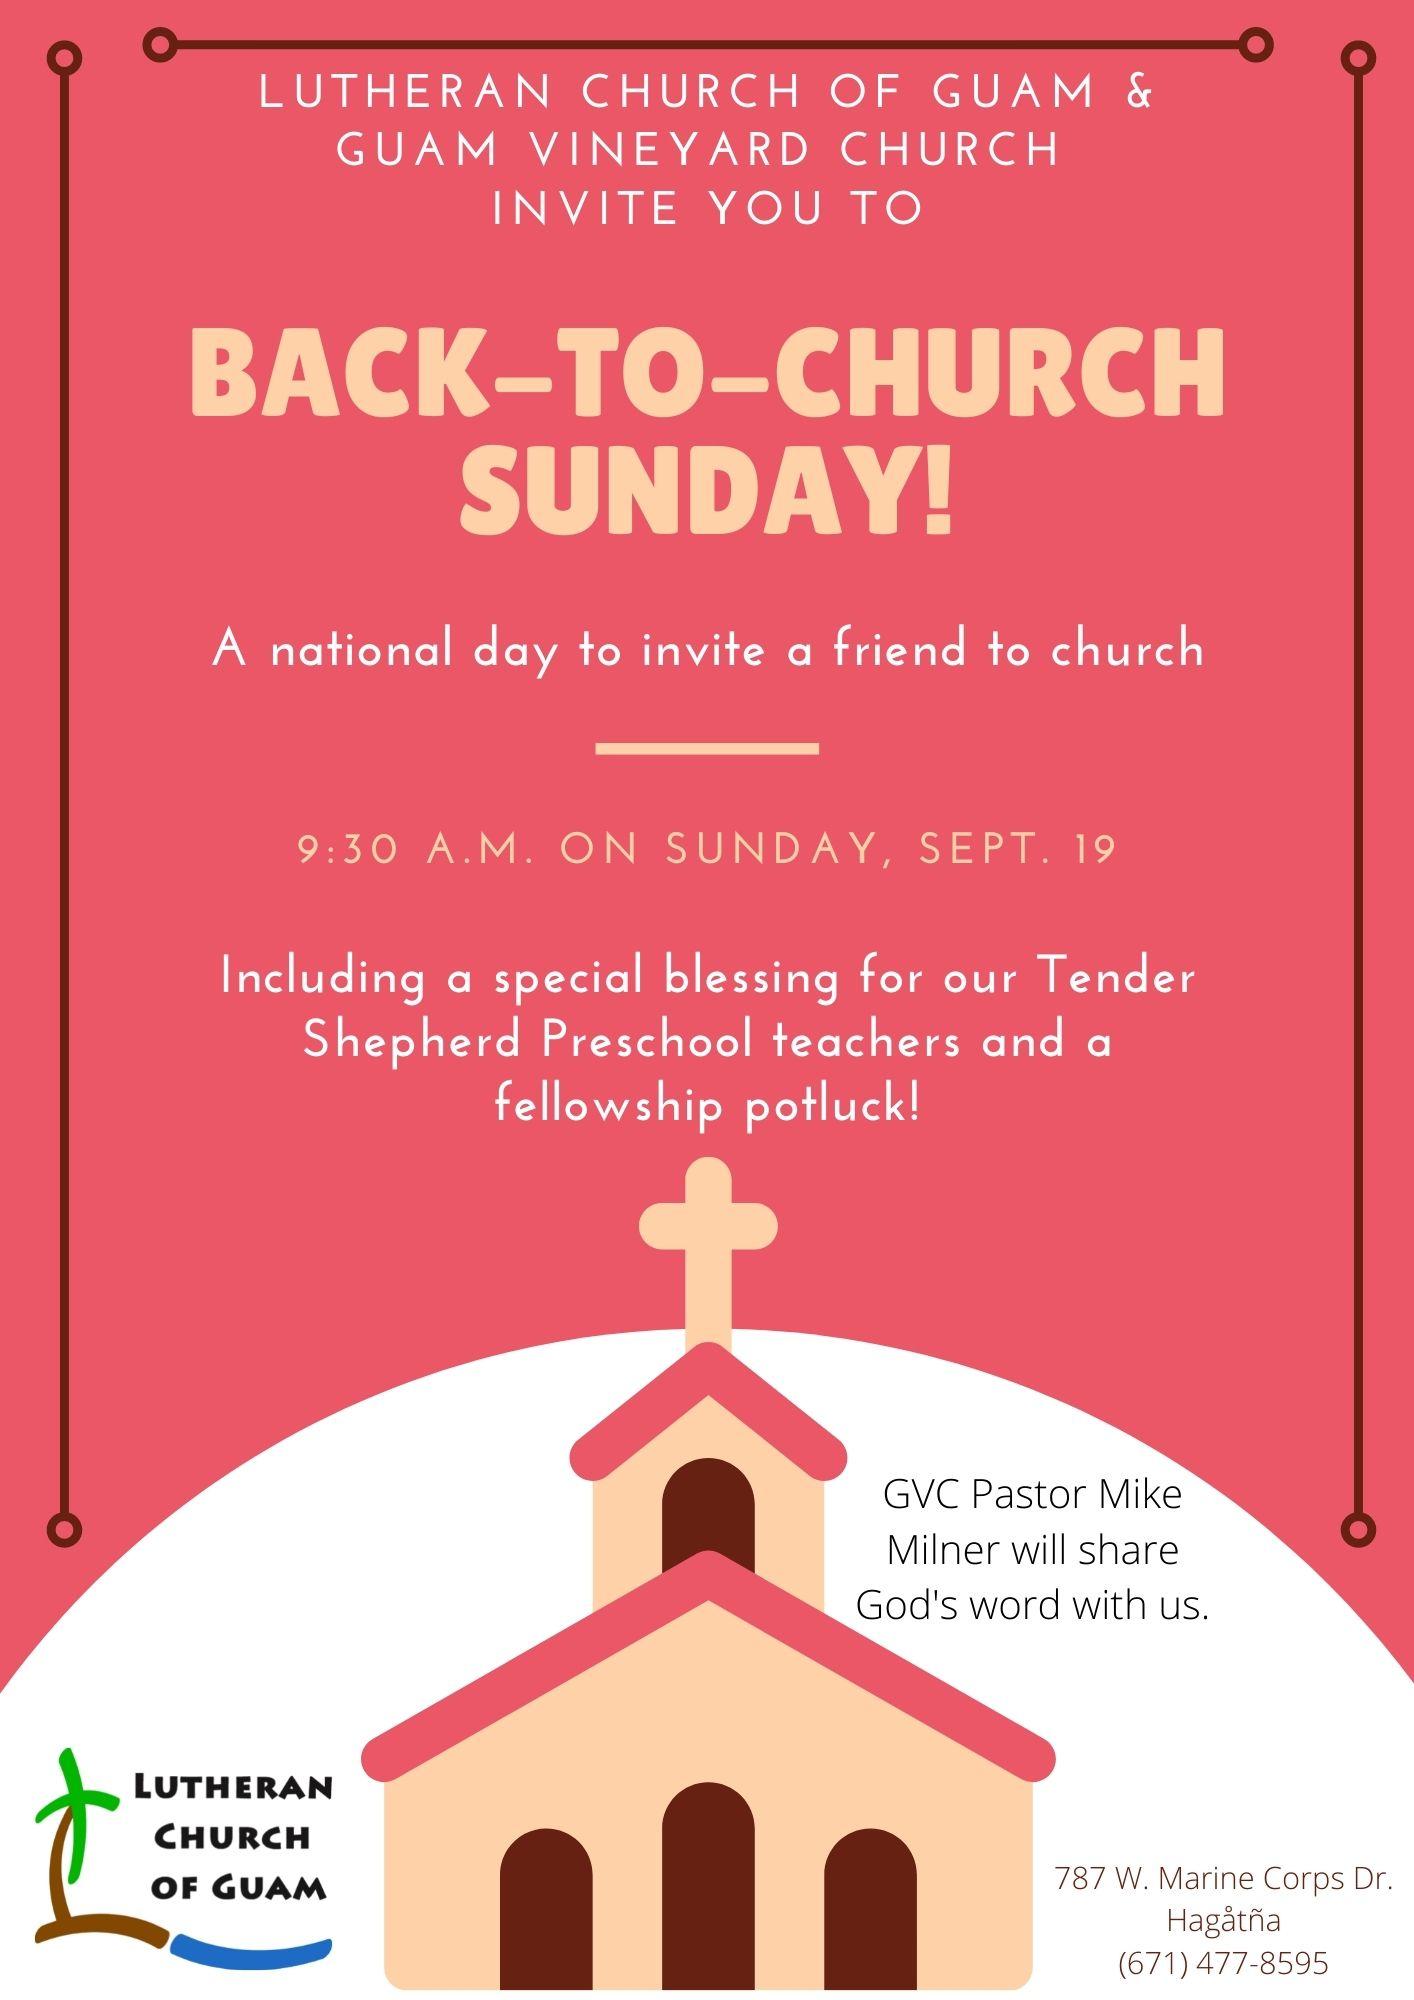 Back-to-Church Sunday!